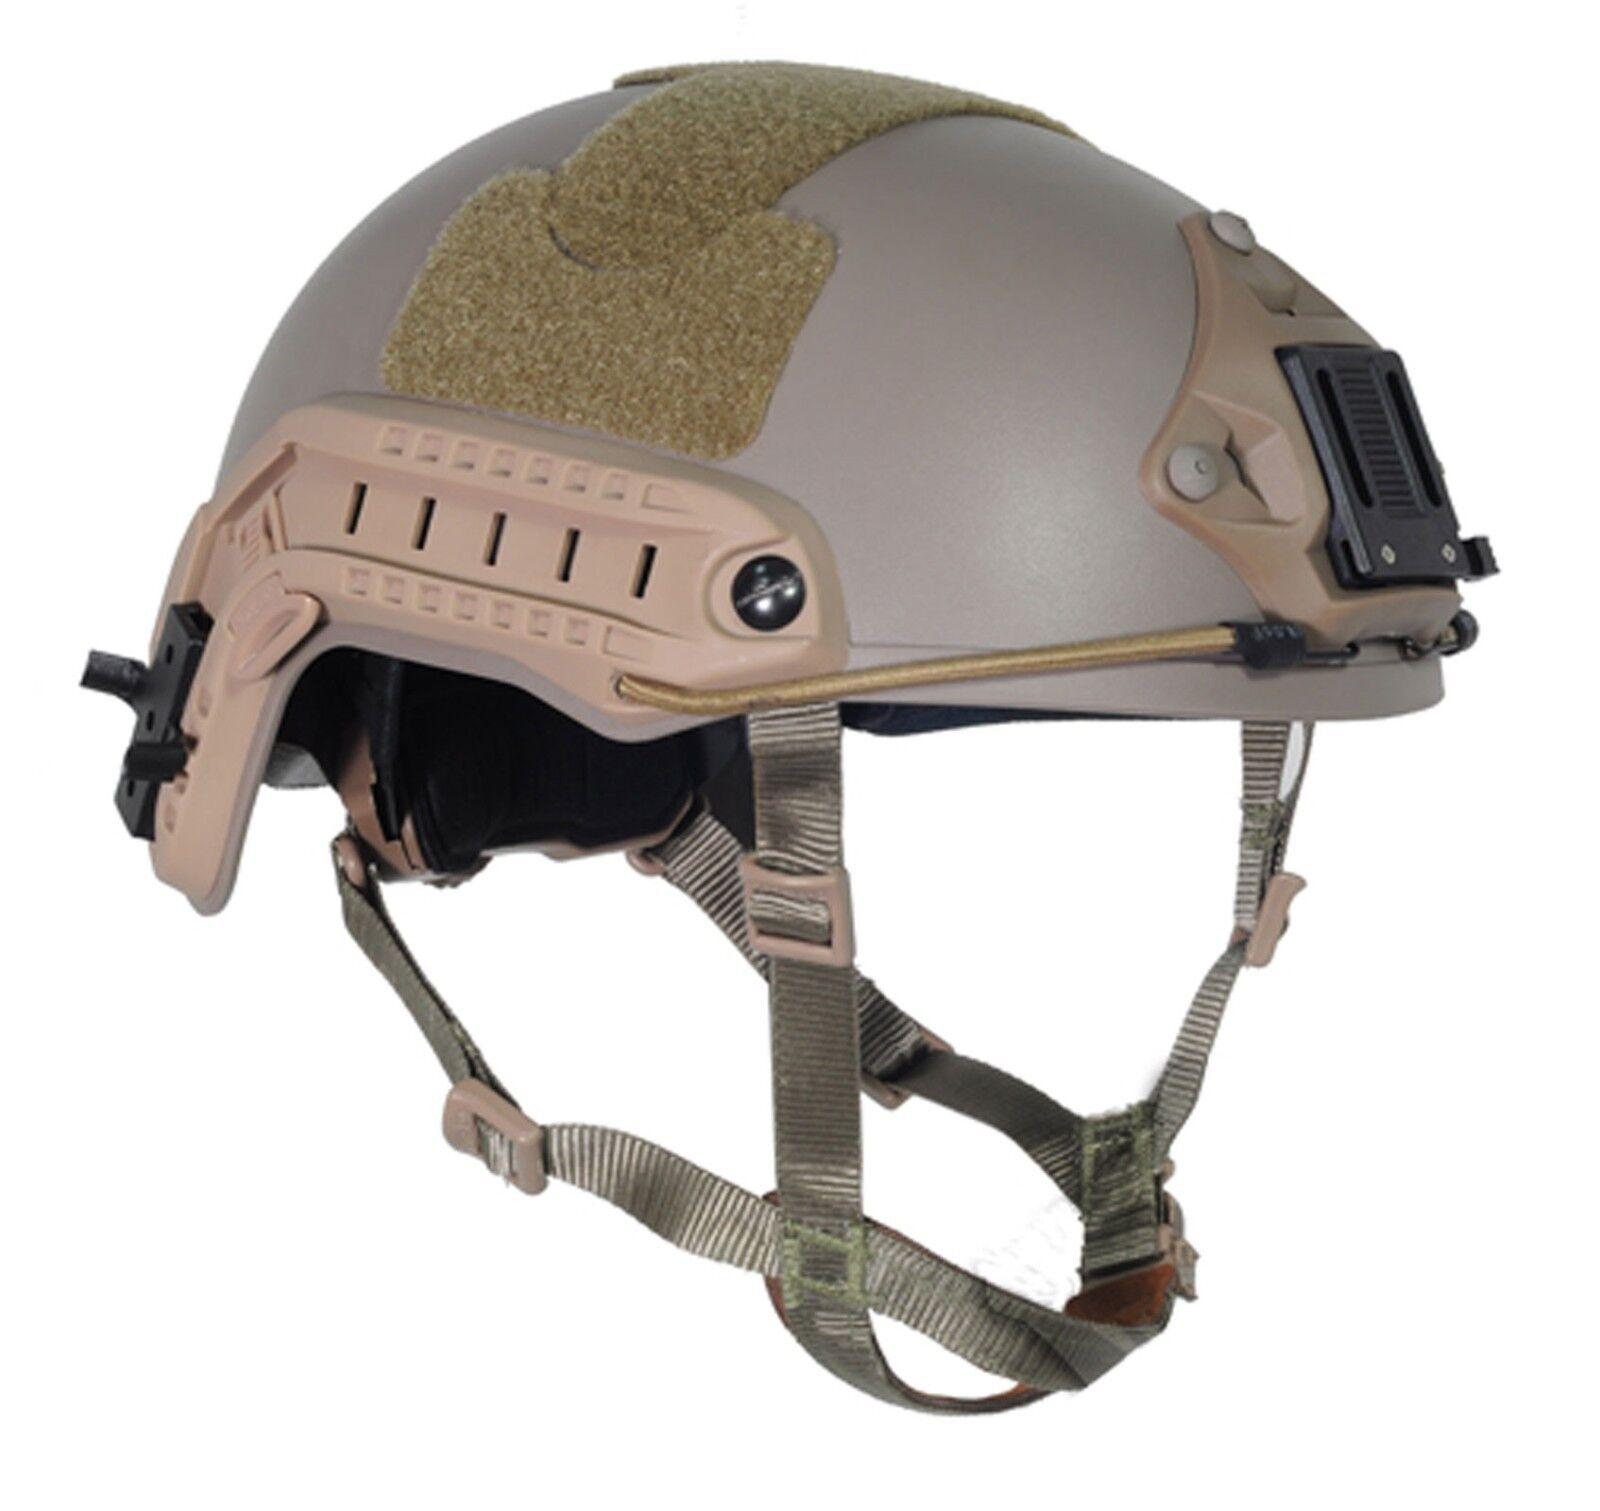 Military Tactical Airsoft Paintball FMA Ballistic Helmet DE T825 M L